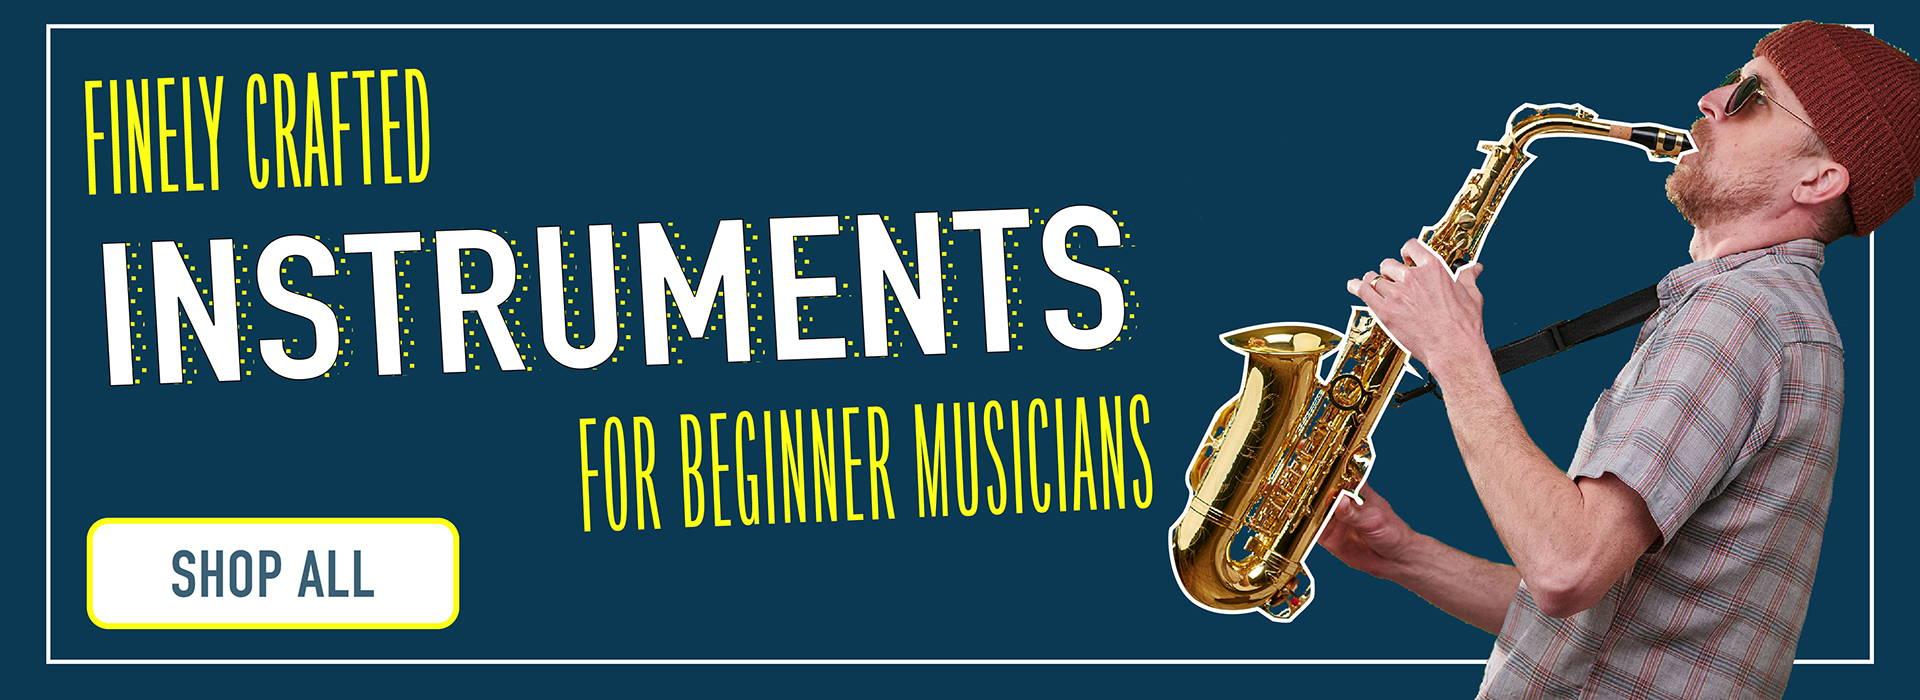 Shop all beginner music instruments